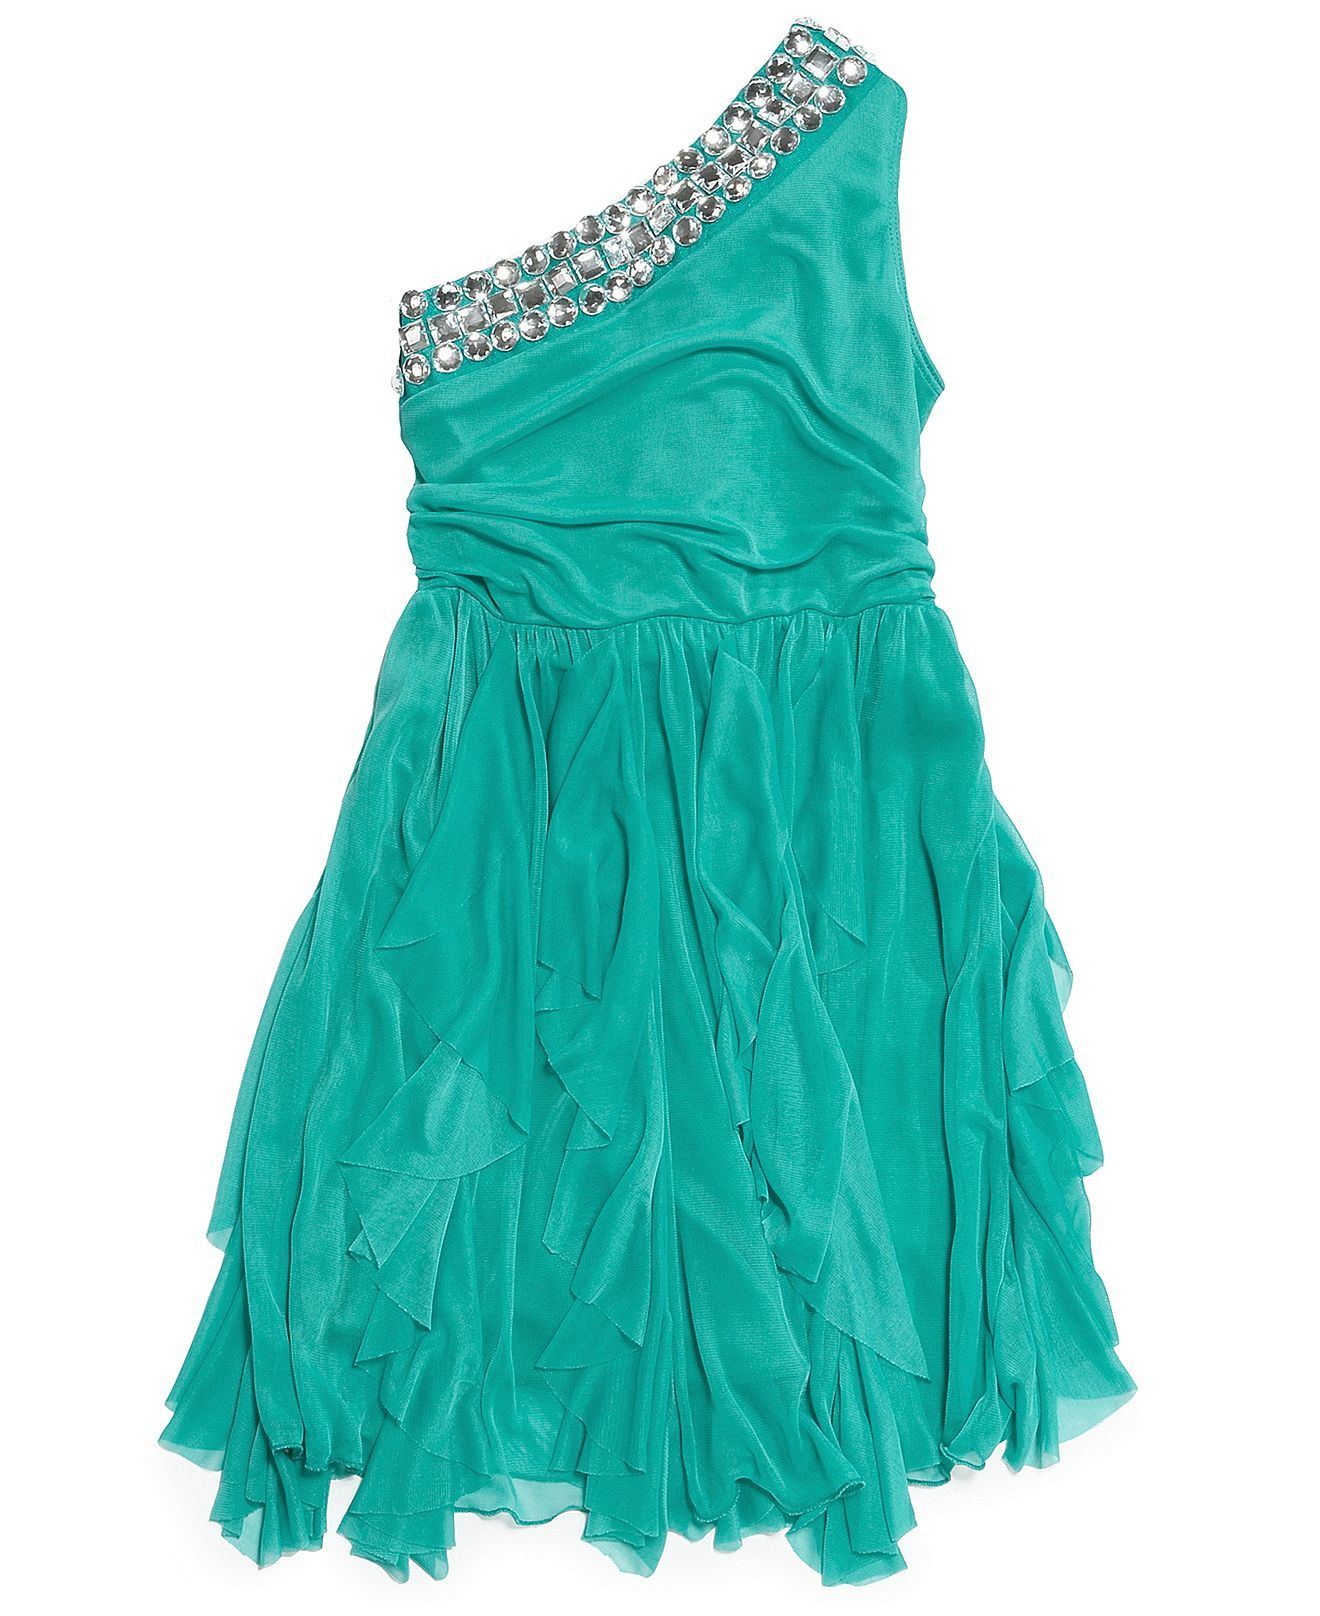 Ruby Rox Girls\' One-Shoulder Dress - Kids Girls 7-16 - Macy\'s | Kira ...